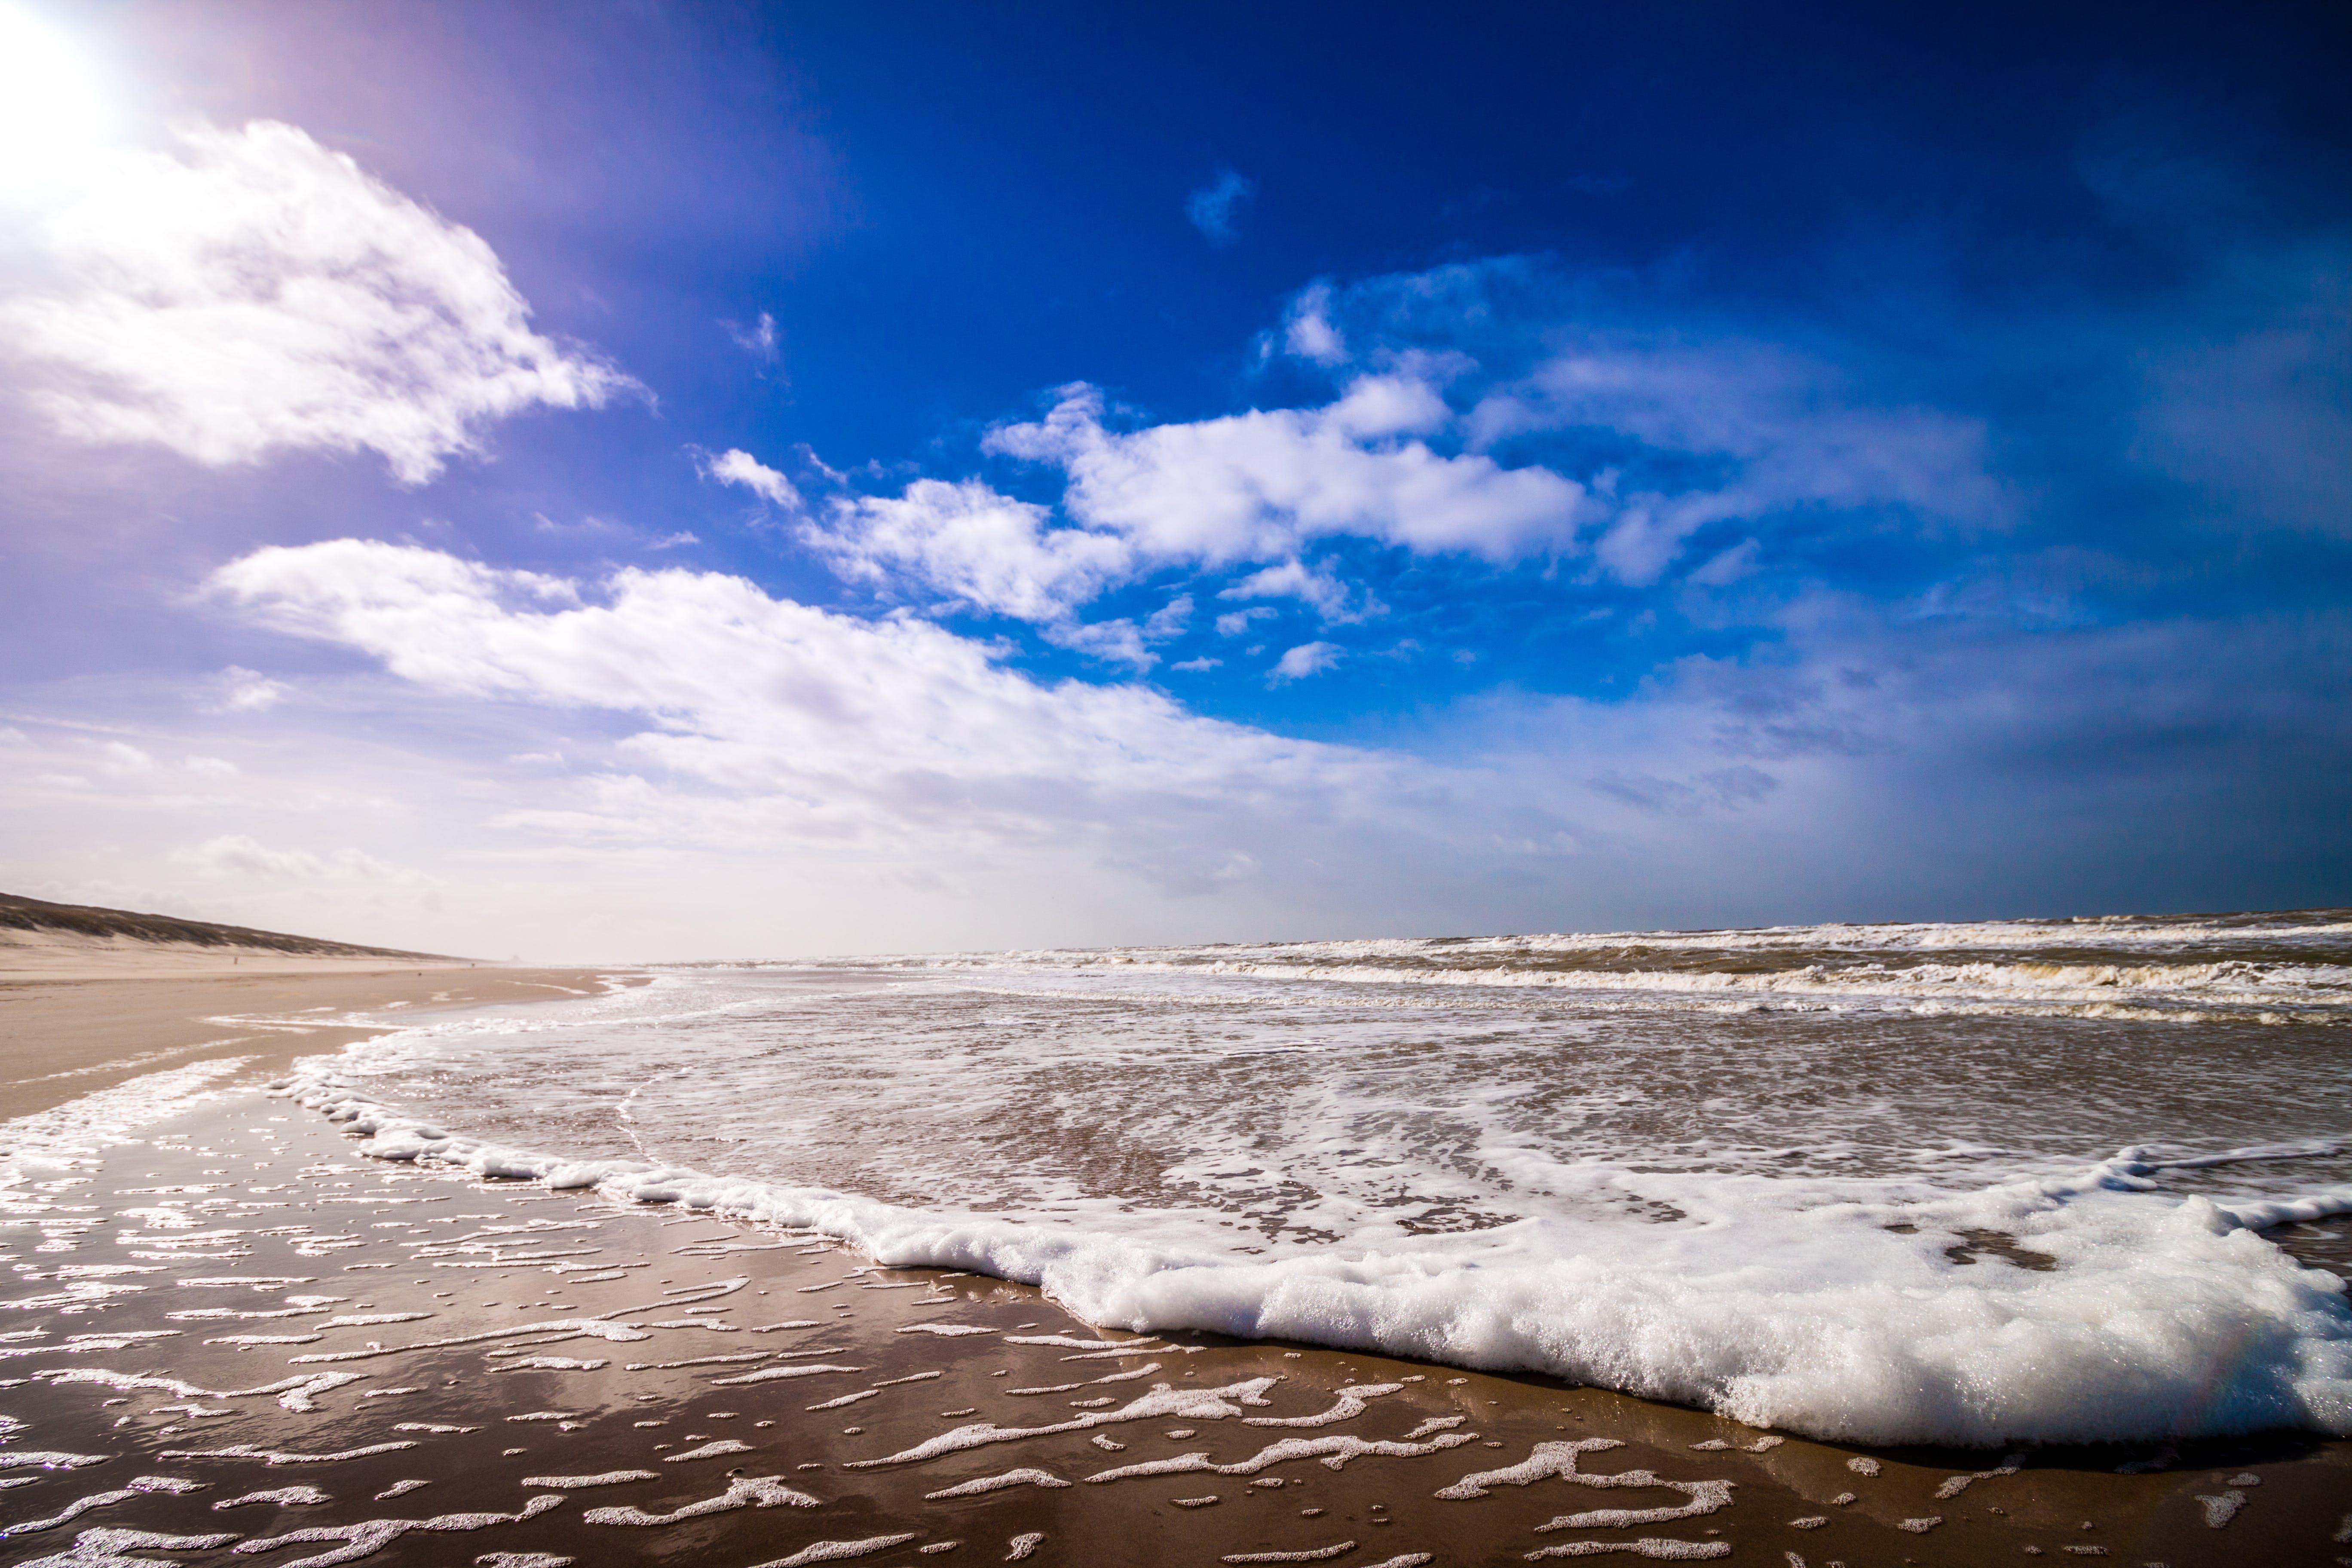 Bike Waves of Sea Under Clouded Blue Sky during Daytime